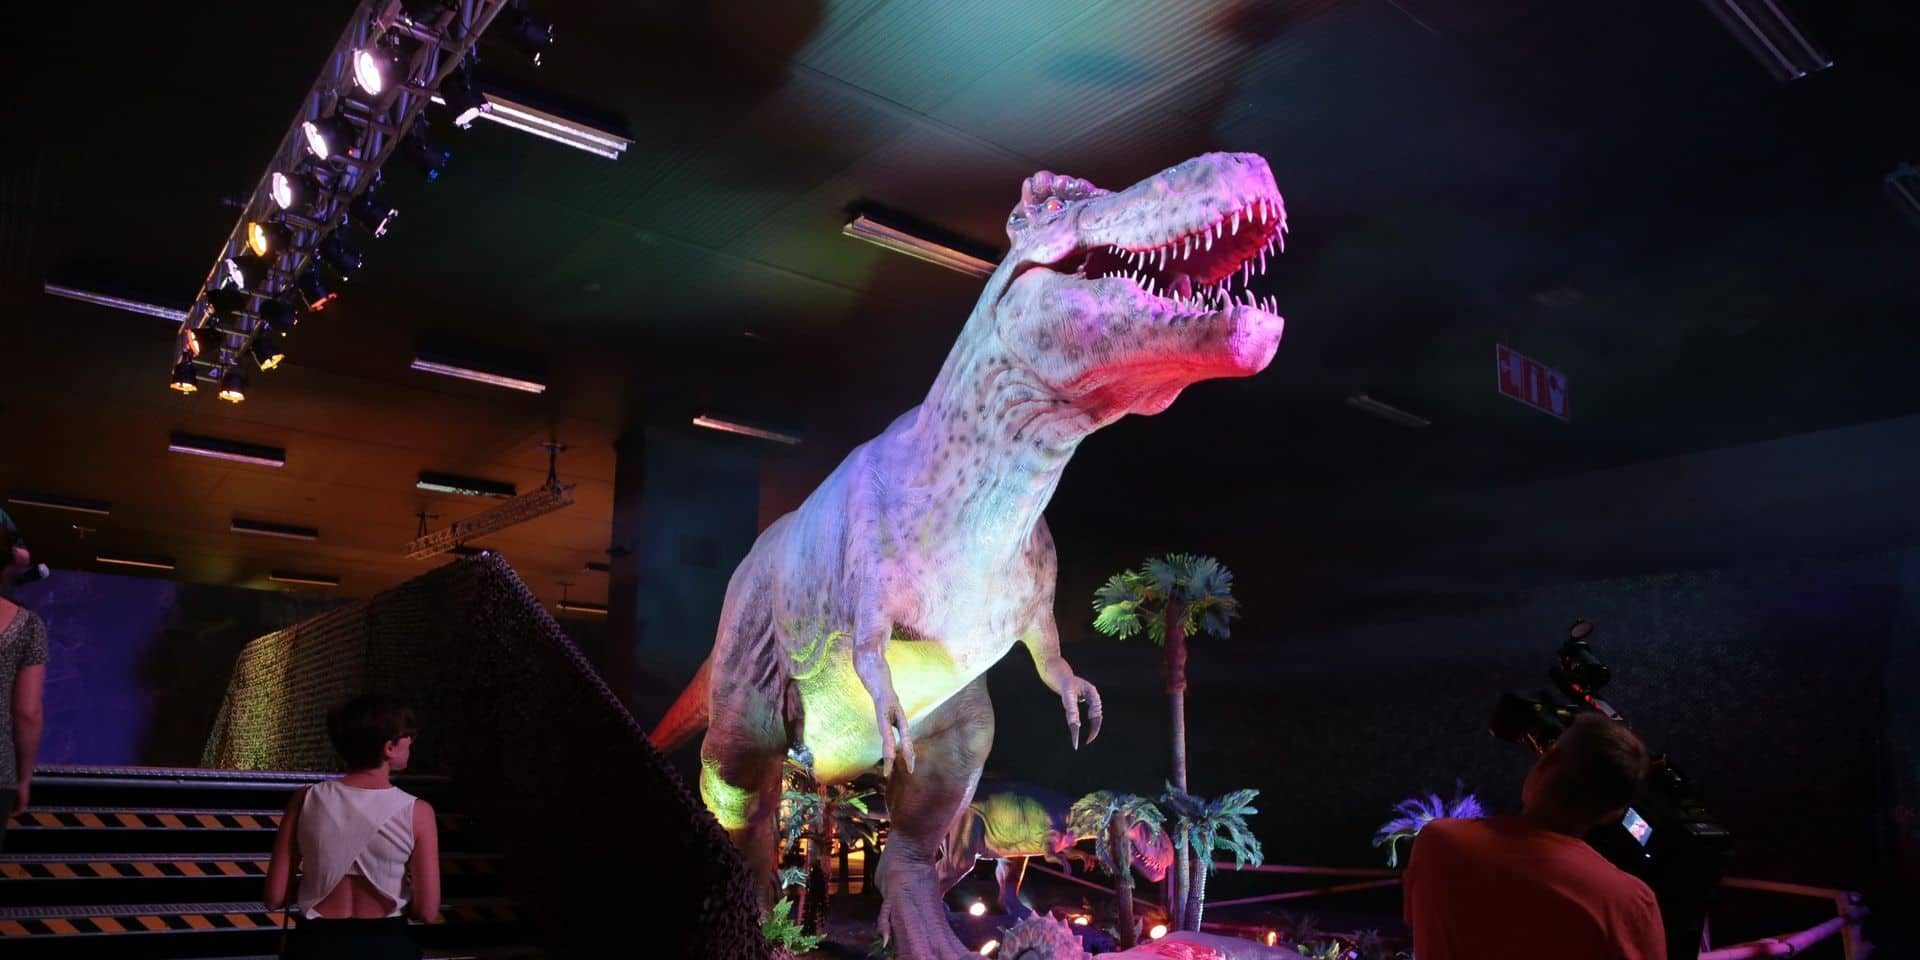 L'exposition Dino World prolongée jusqu'au 31 août